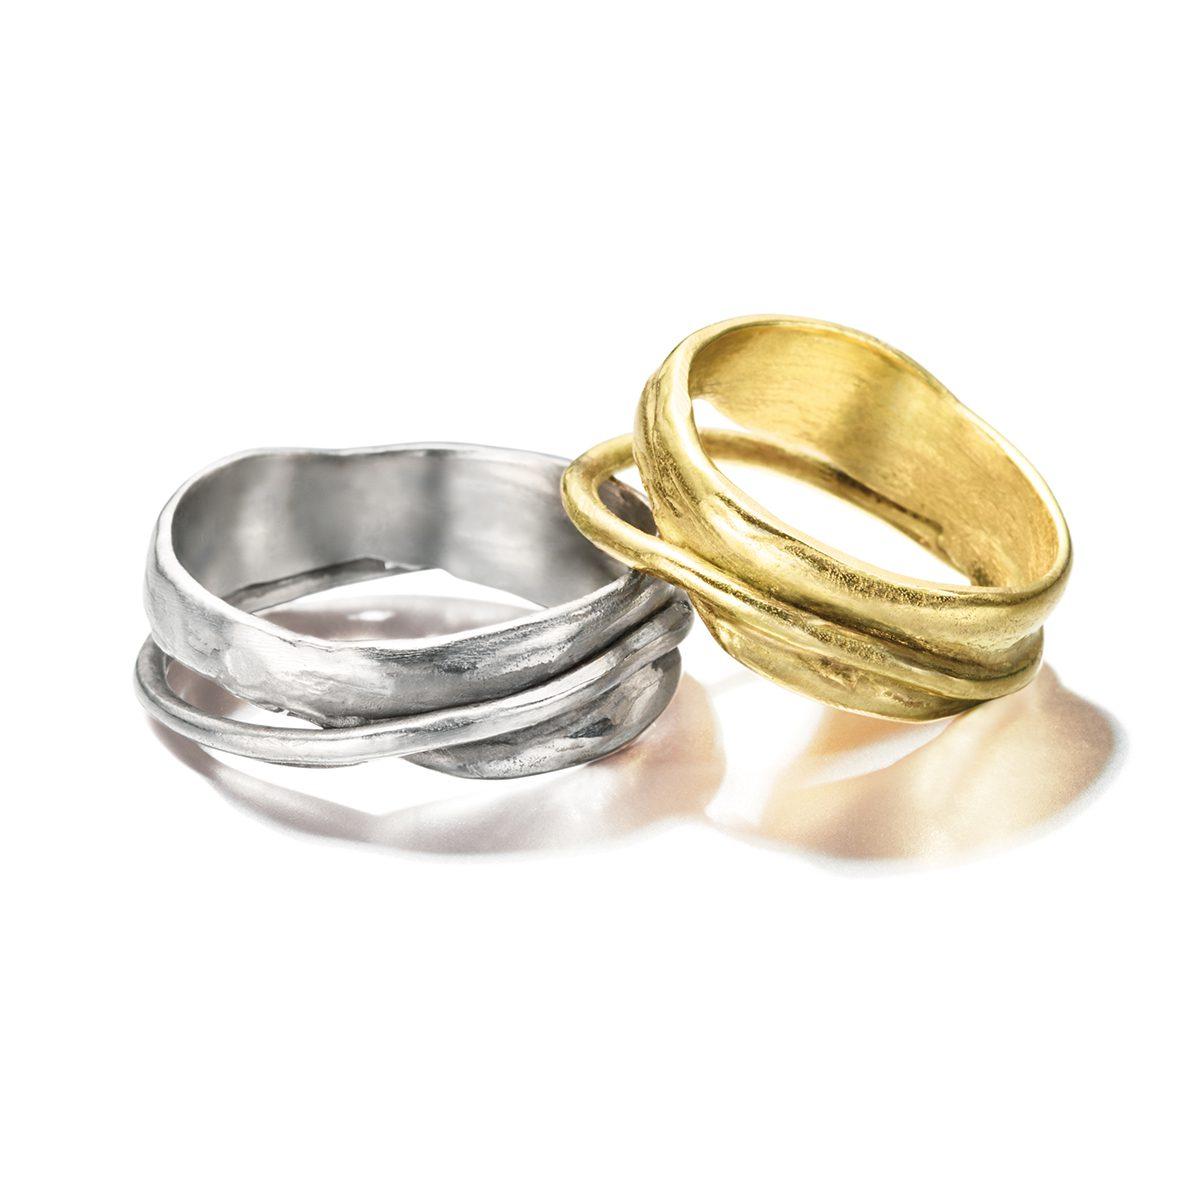 IOSSELLIANI - INCNATO Marriage Rings